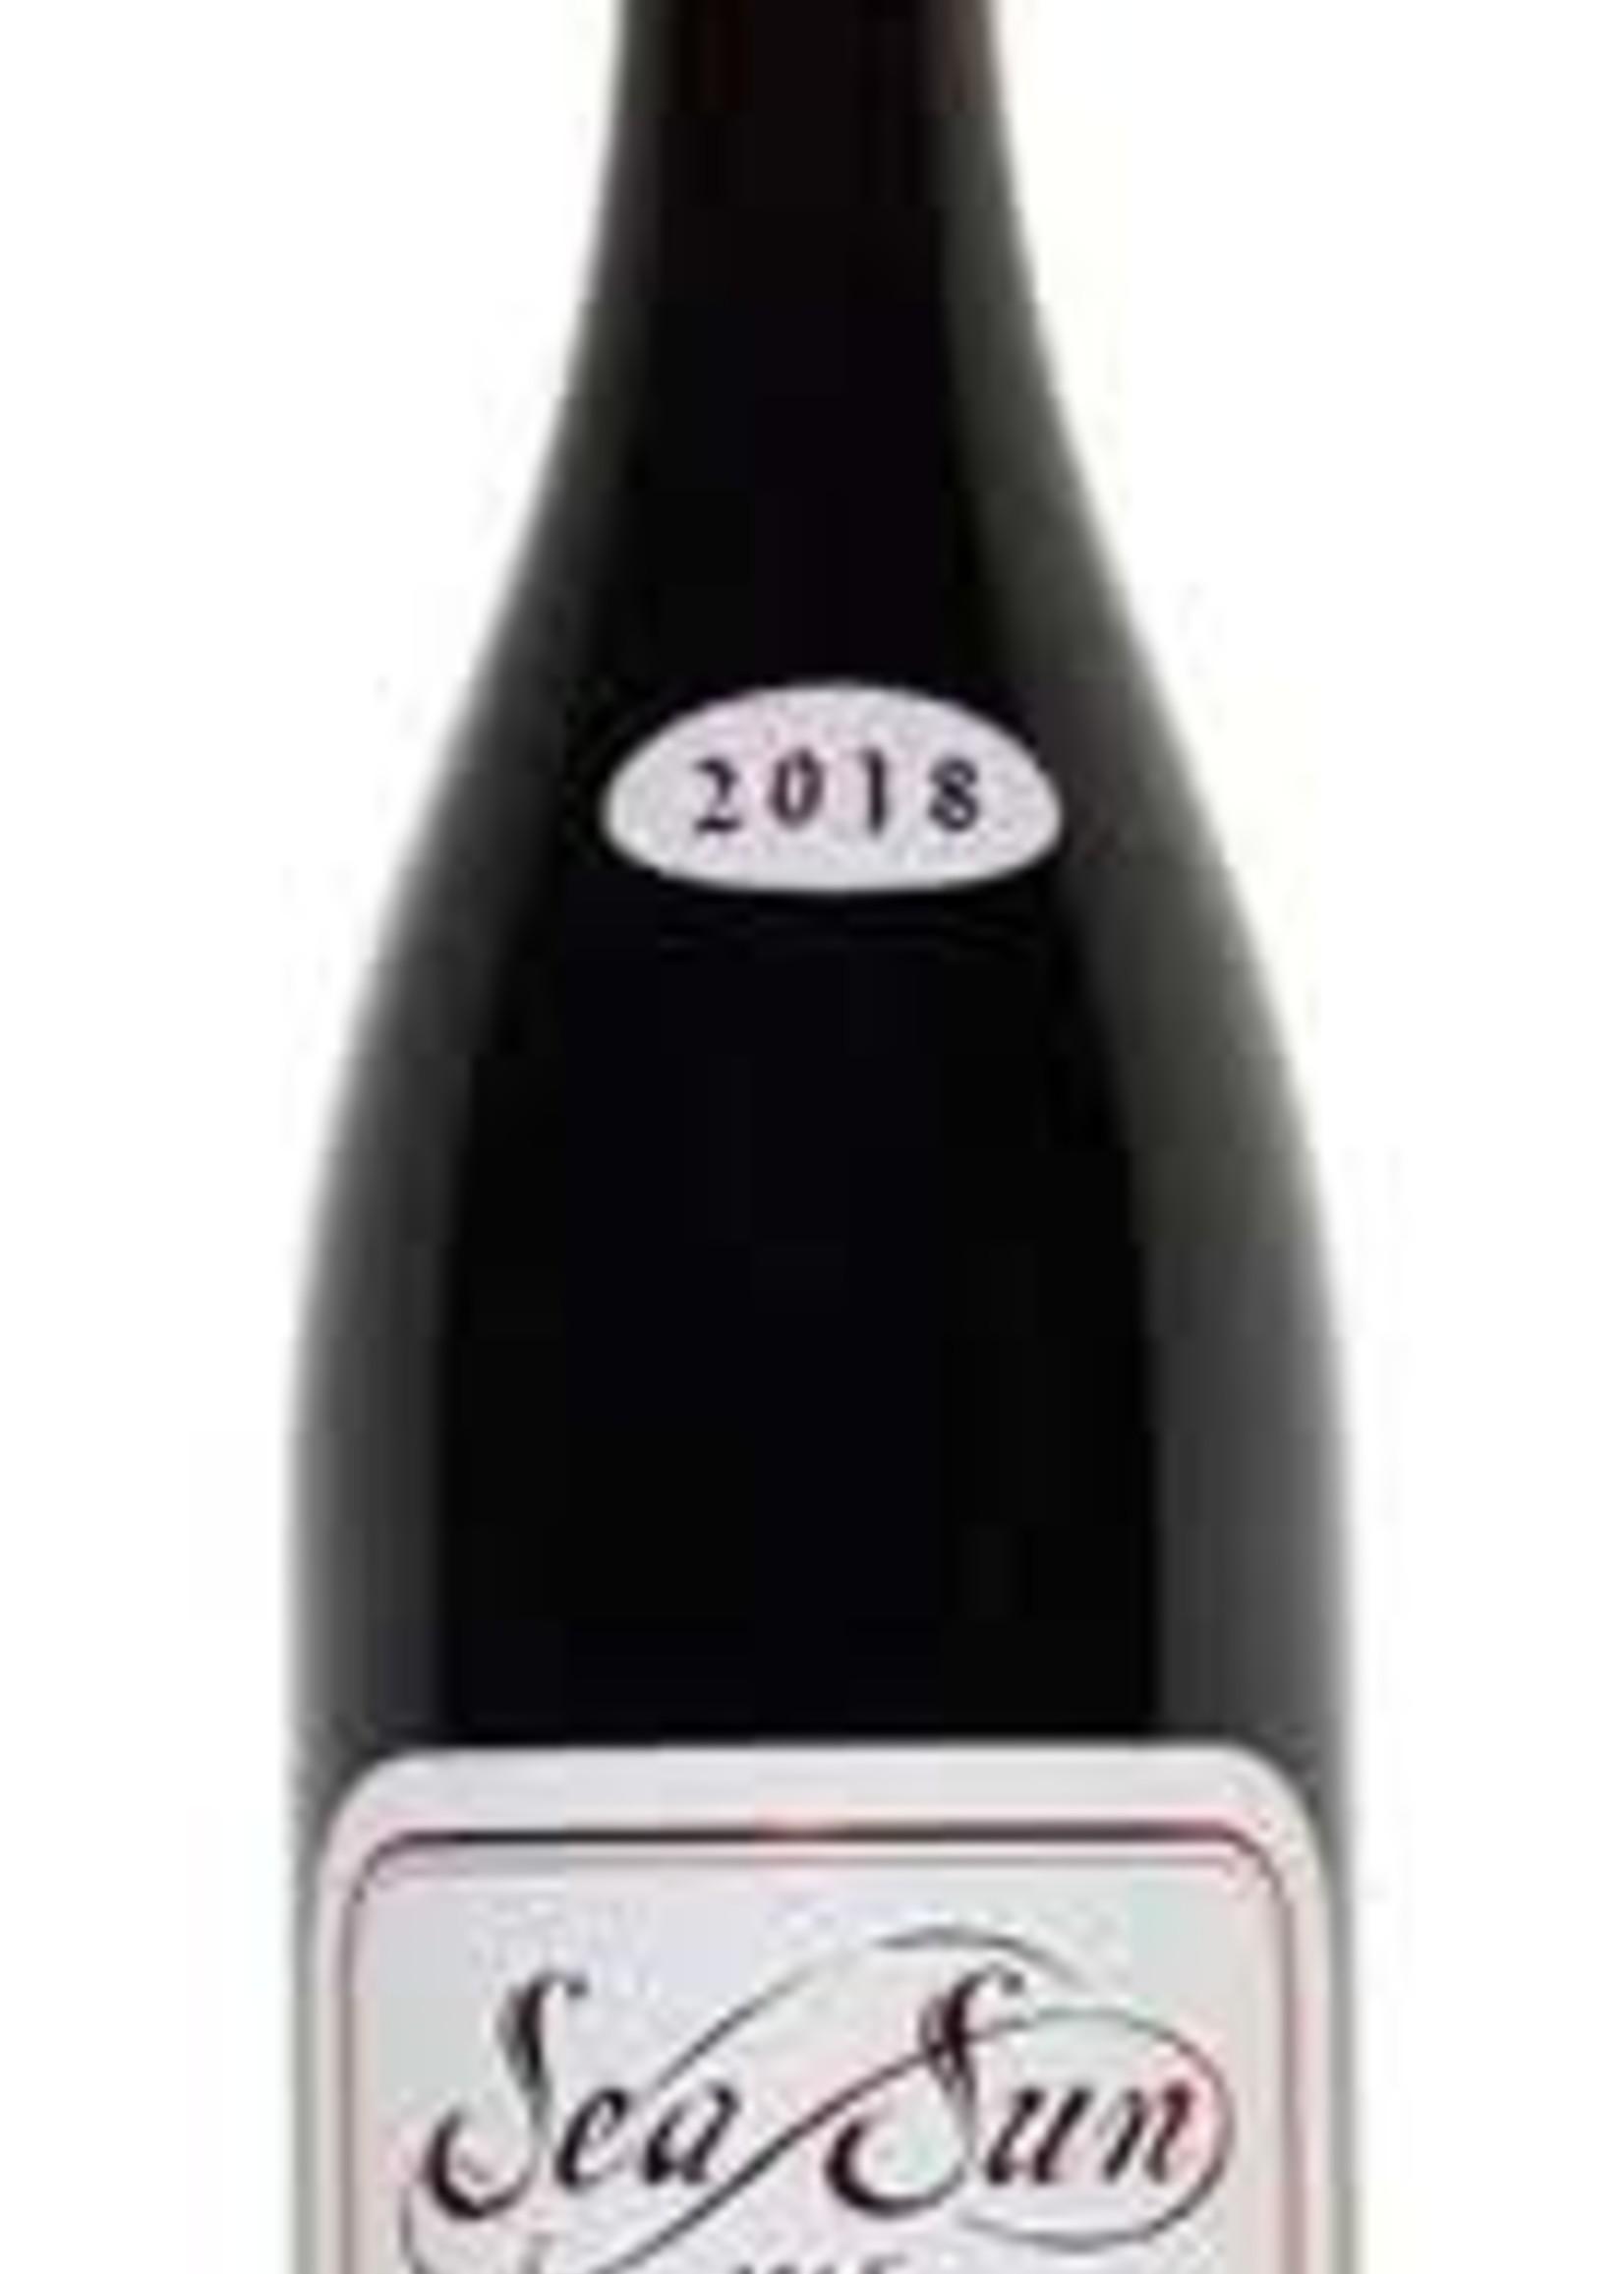 Caymus Sea Sun Pinot Noir